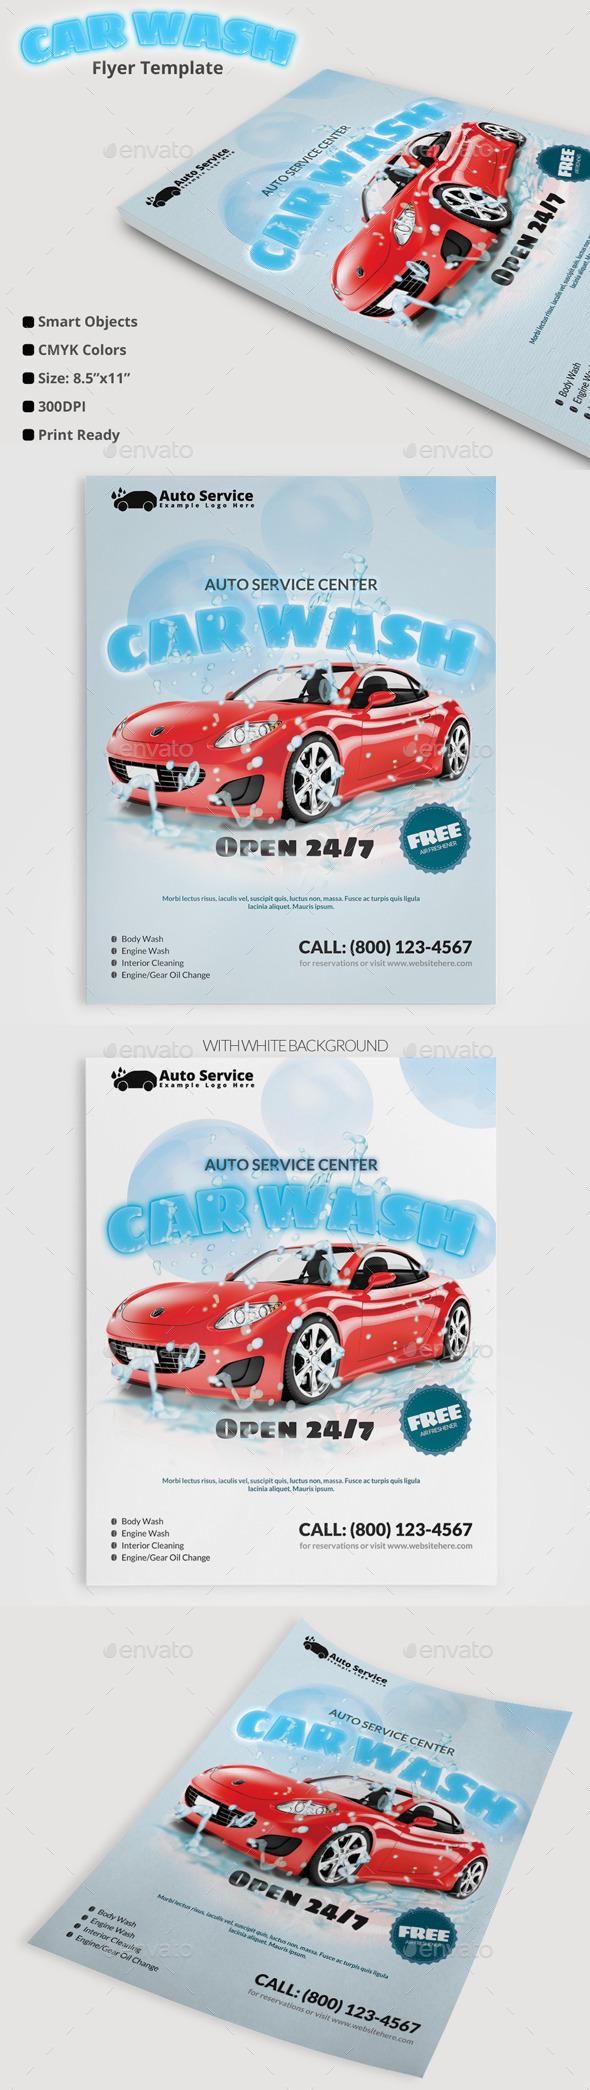 Car Wash Flyer - Commerce Flyers